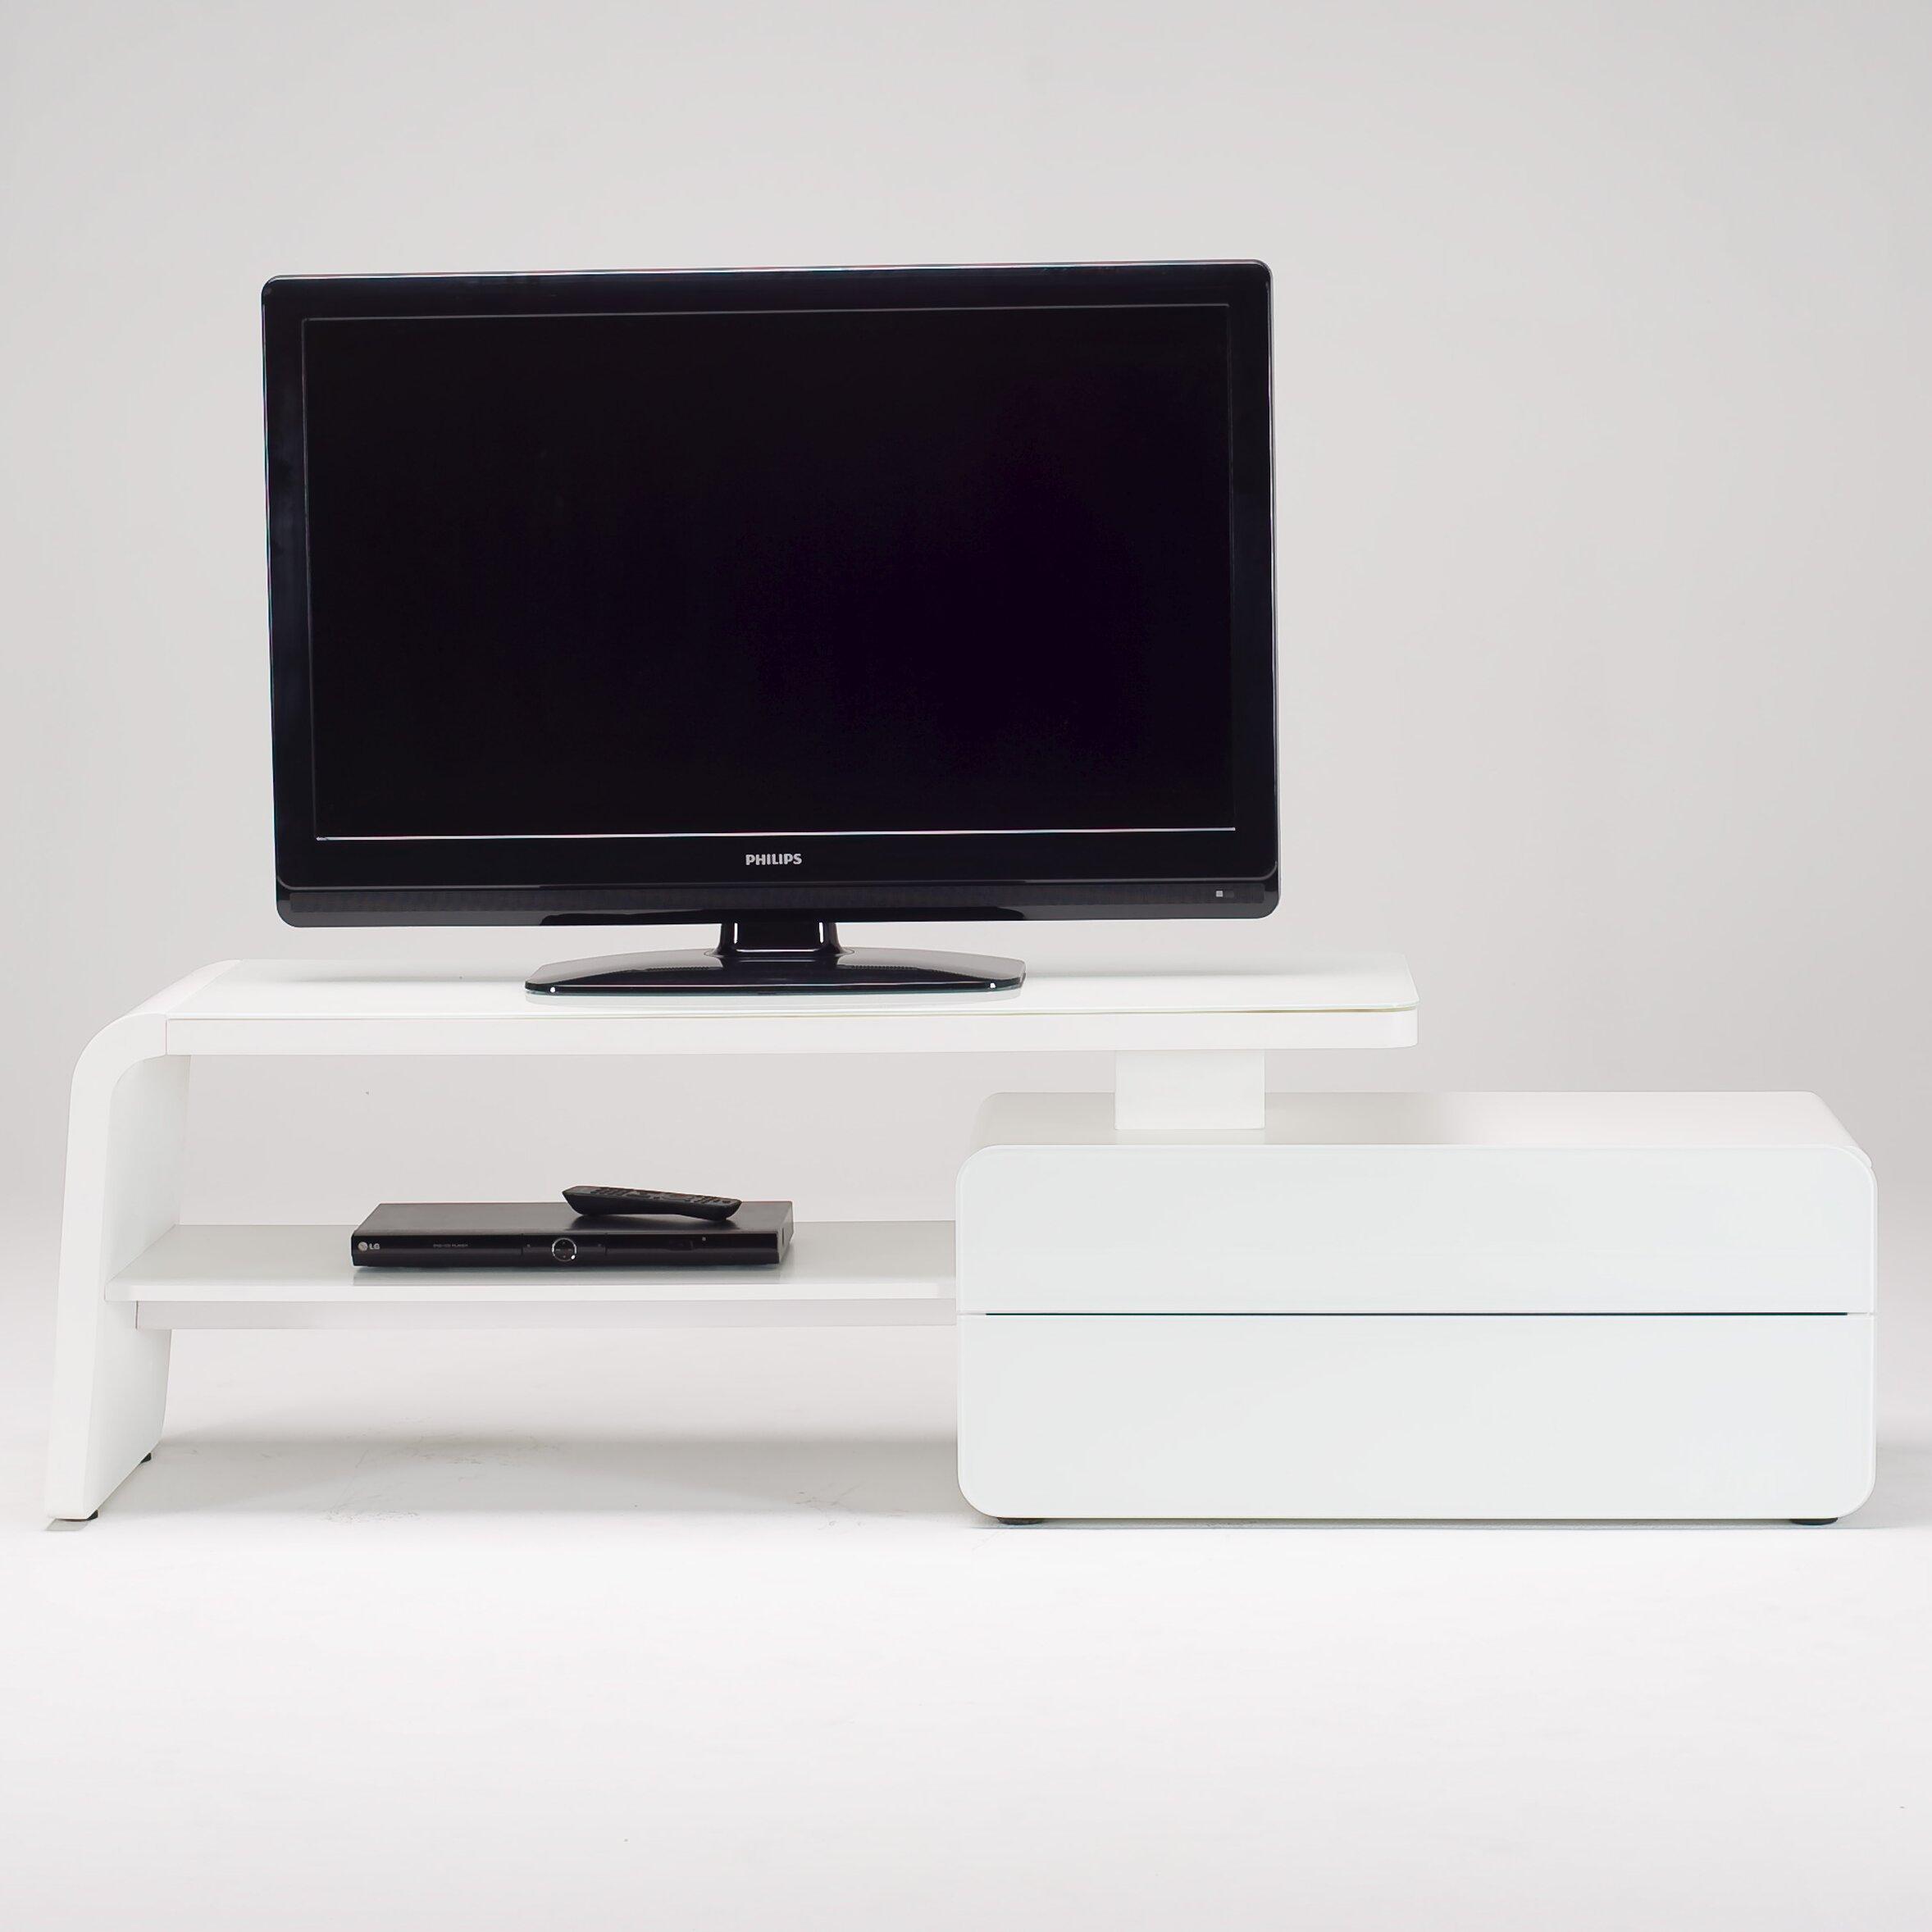 jahnke tv lowboard sl f r tvs bis zu 70 bewertungen. Black Bedroom Furniture Sets. Home Design Ideas